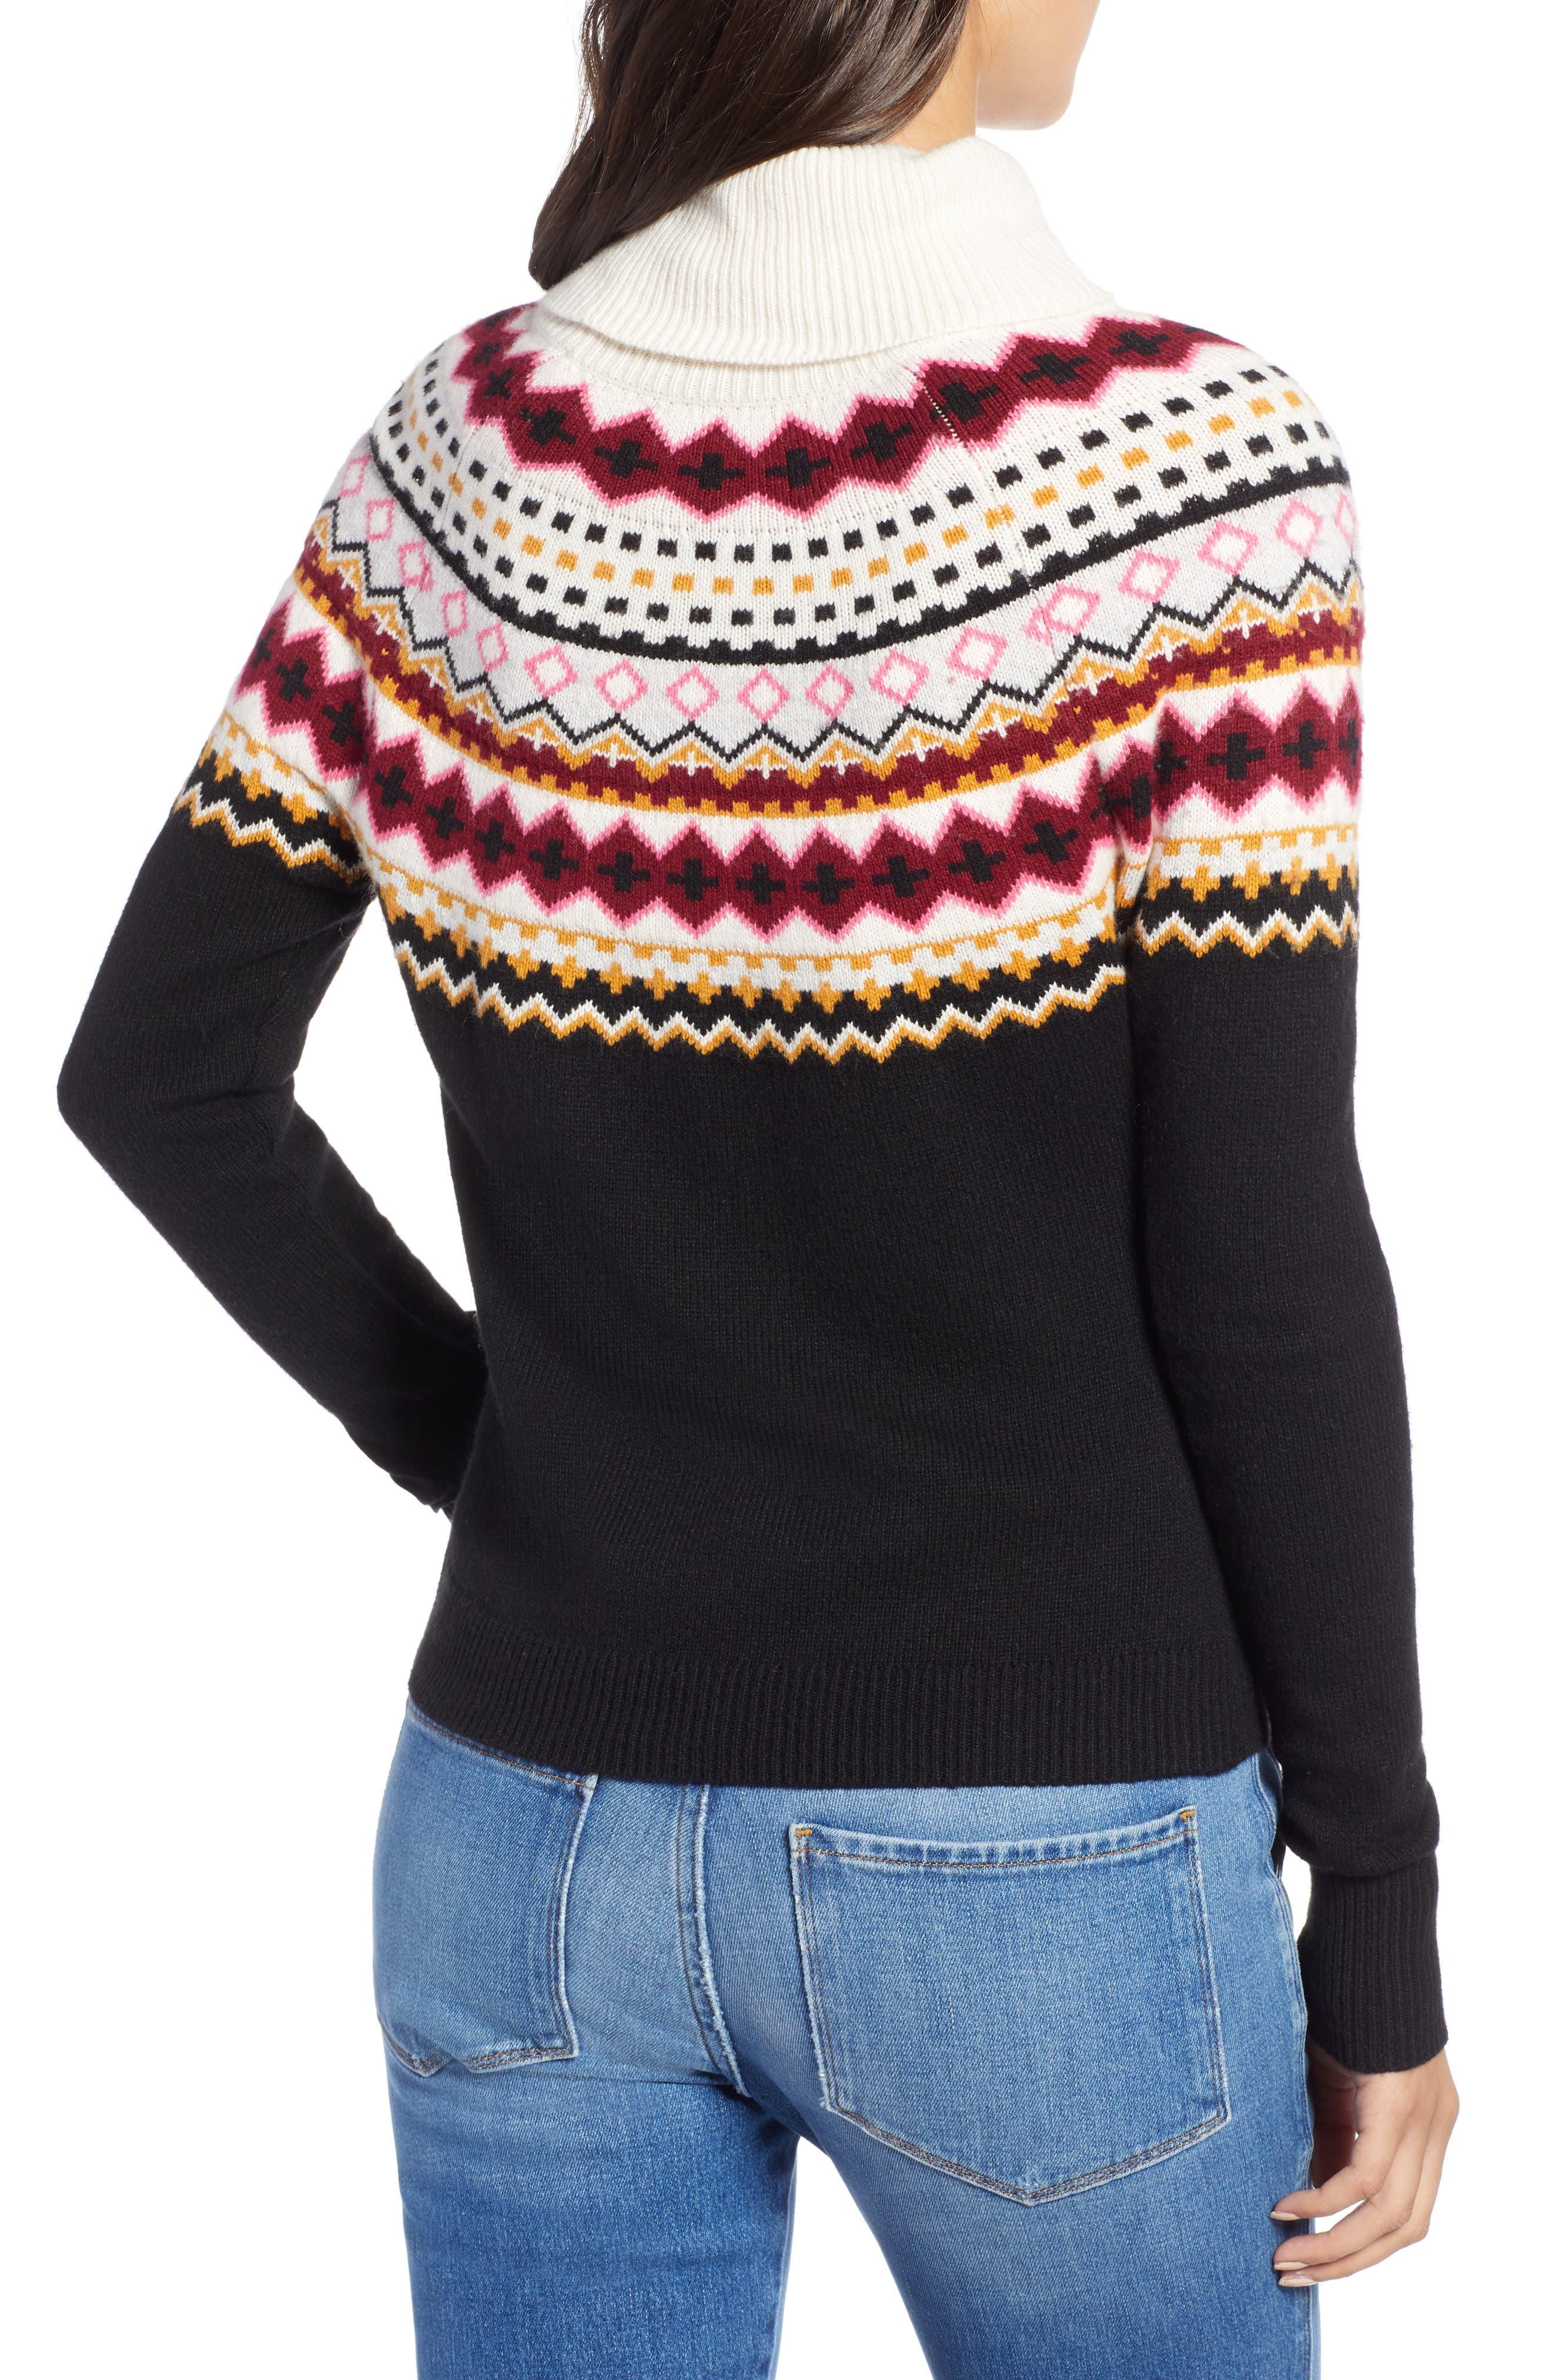 Fair Isle Turtleneck Sweater,                             Alternate thumbnail 2, color,                             001